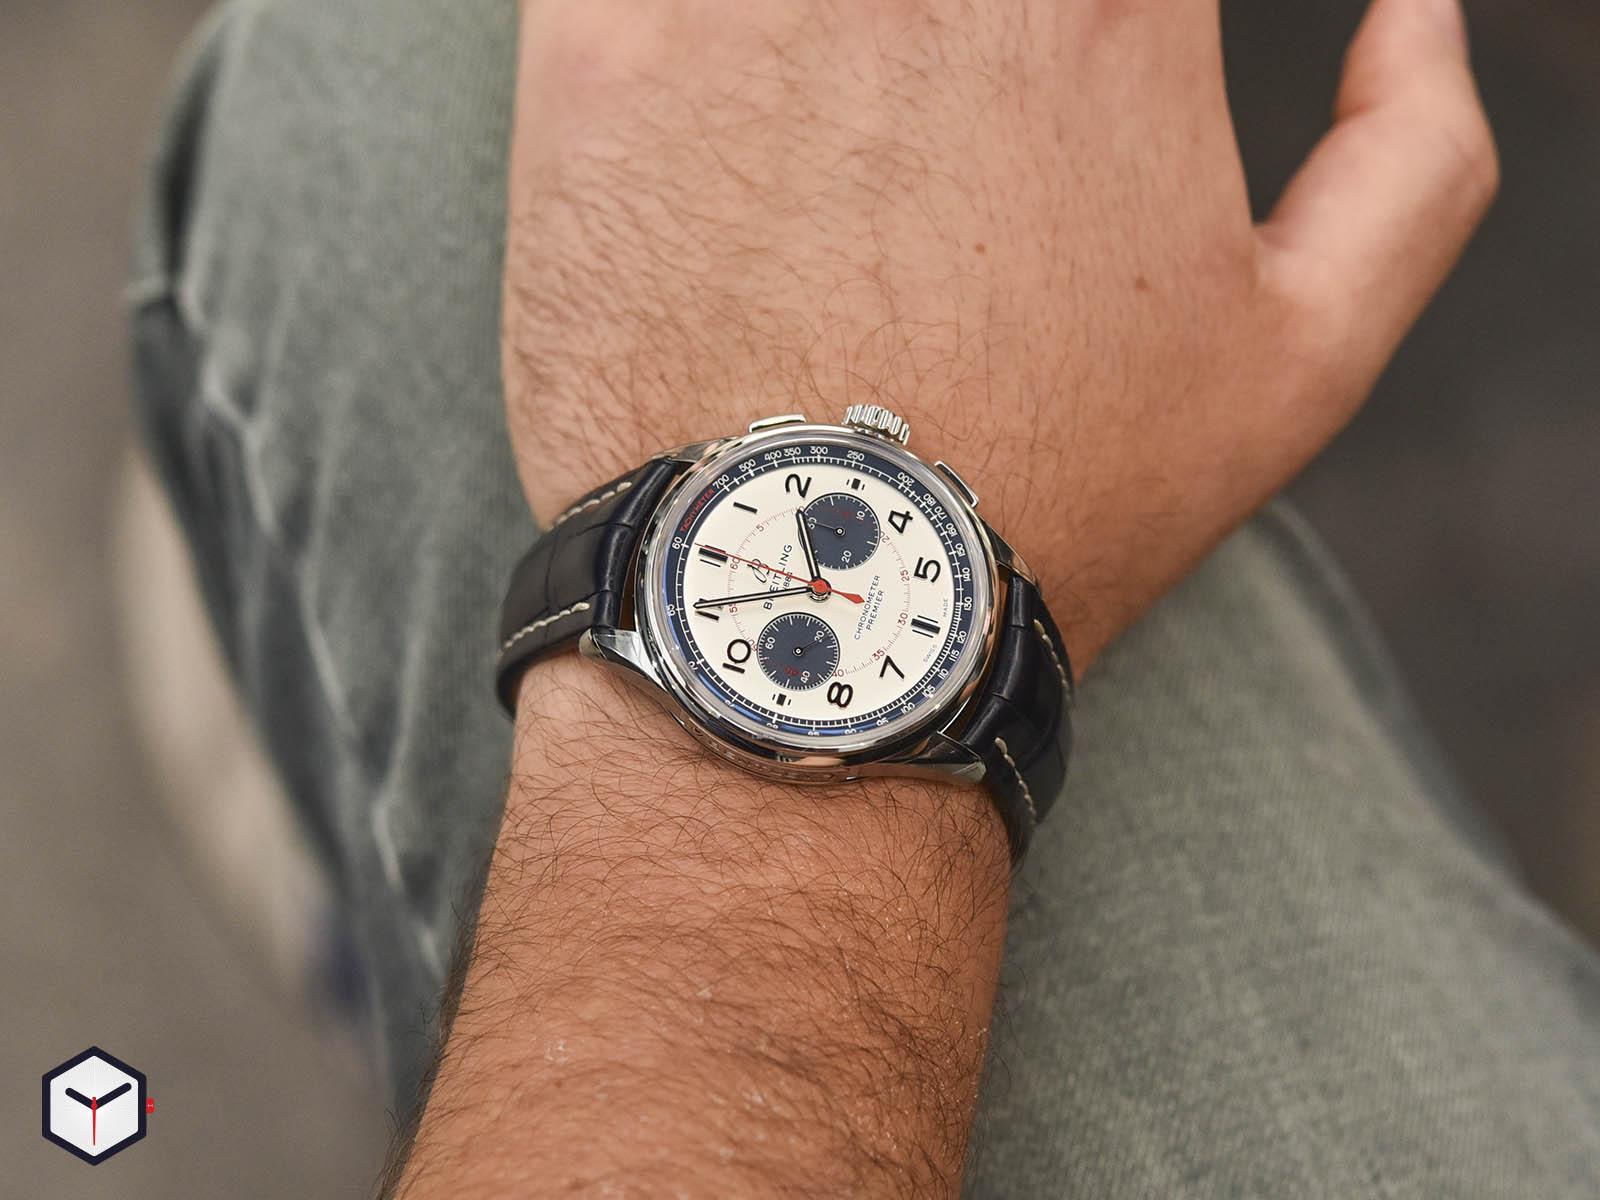 ab0118a71g1p1-breitling-premier-b01-chronograph-42-bentley-mulliner-7.jpg